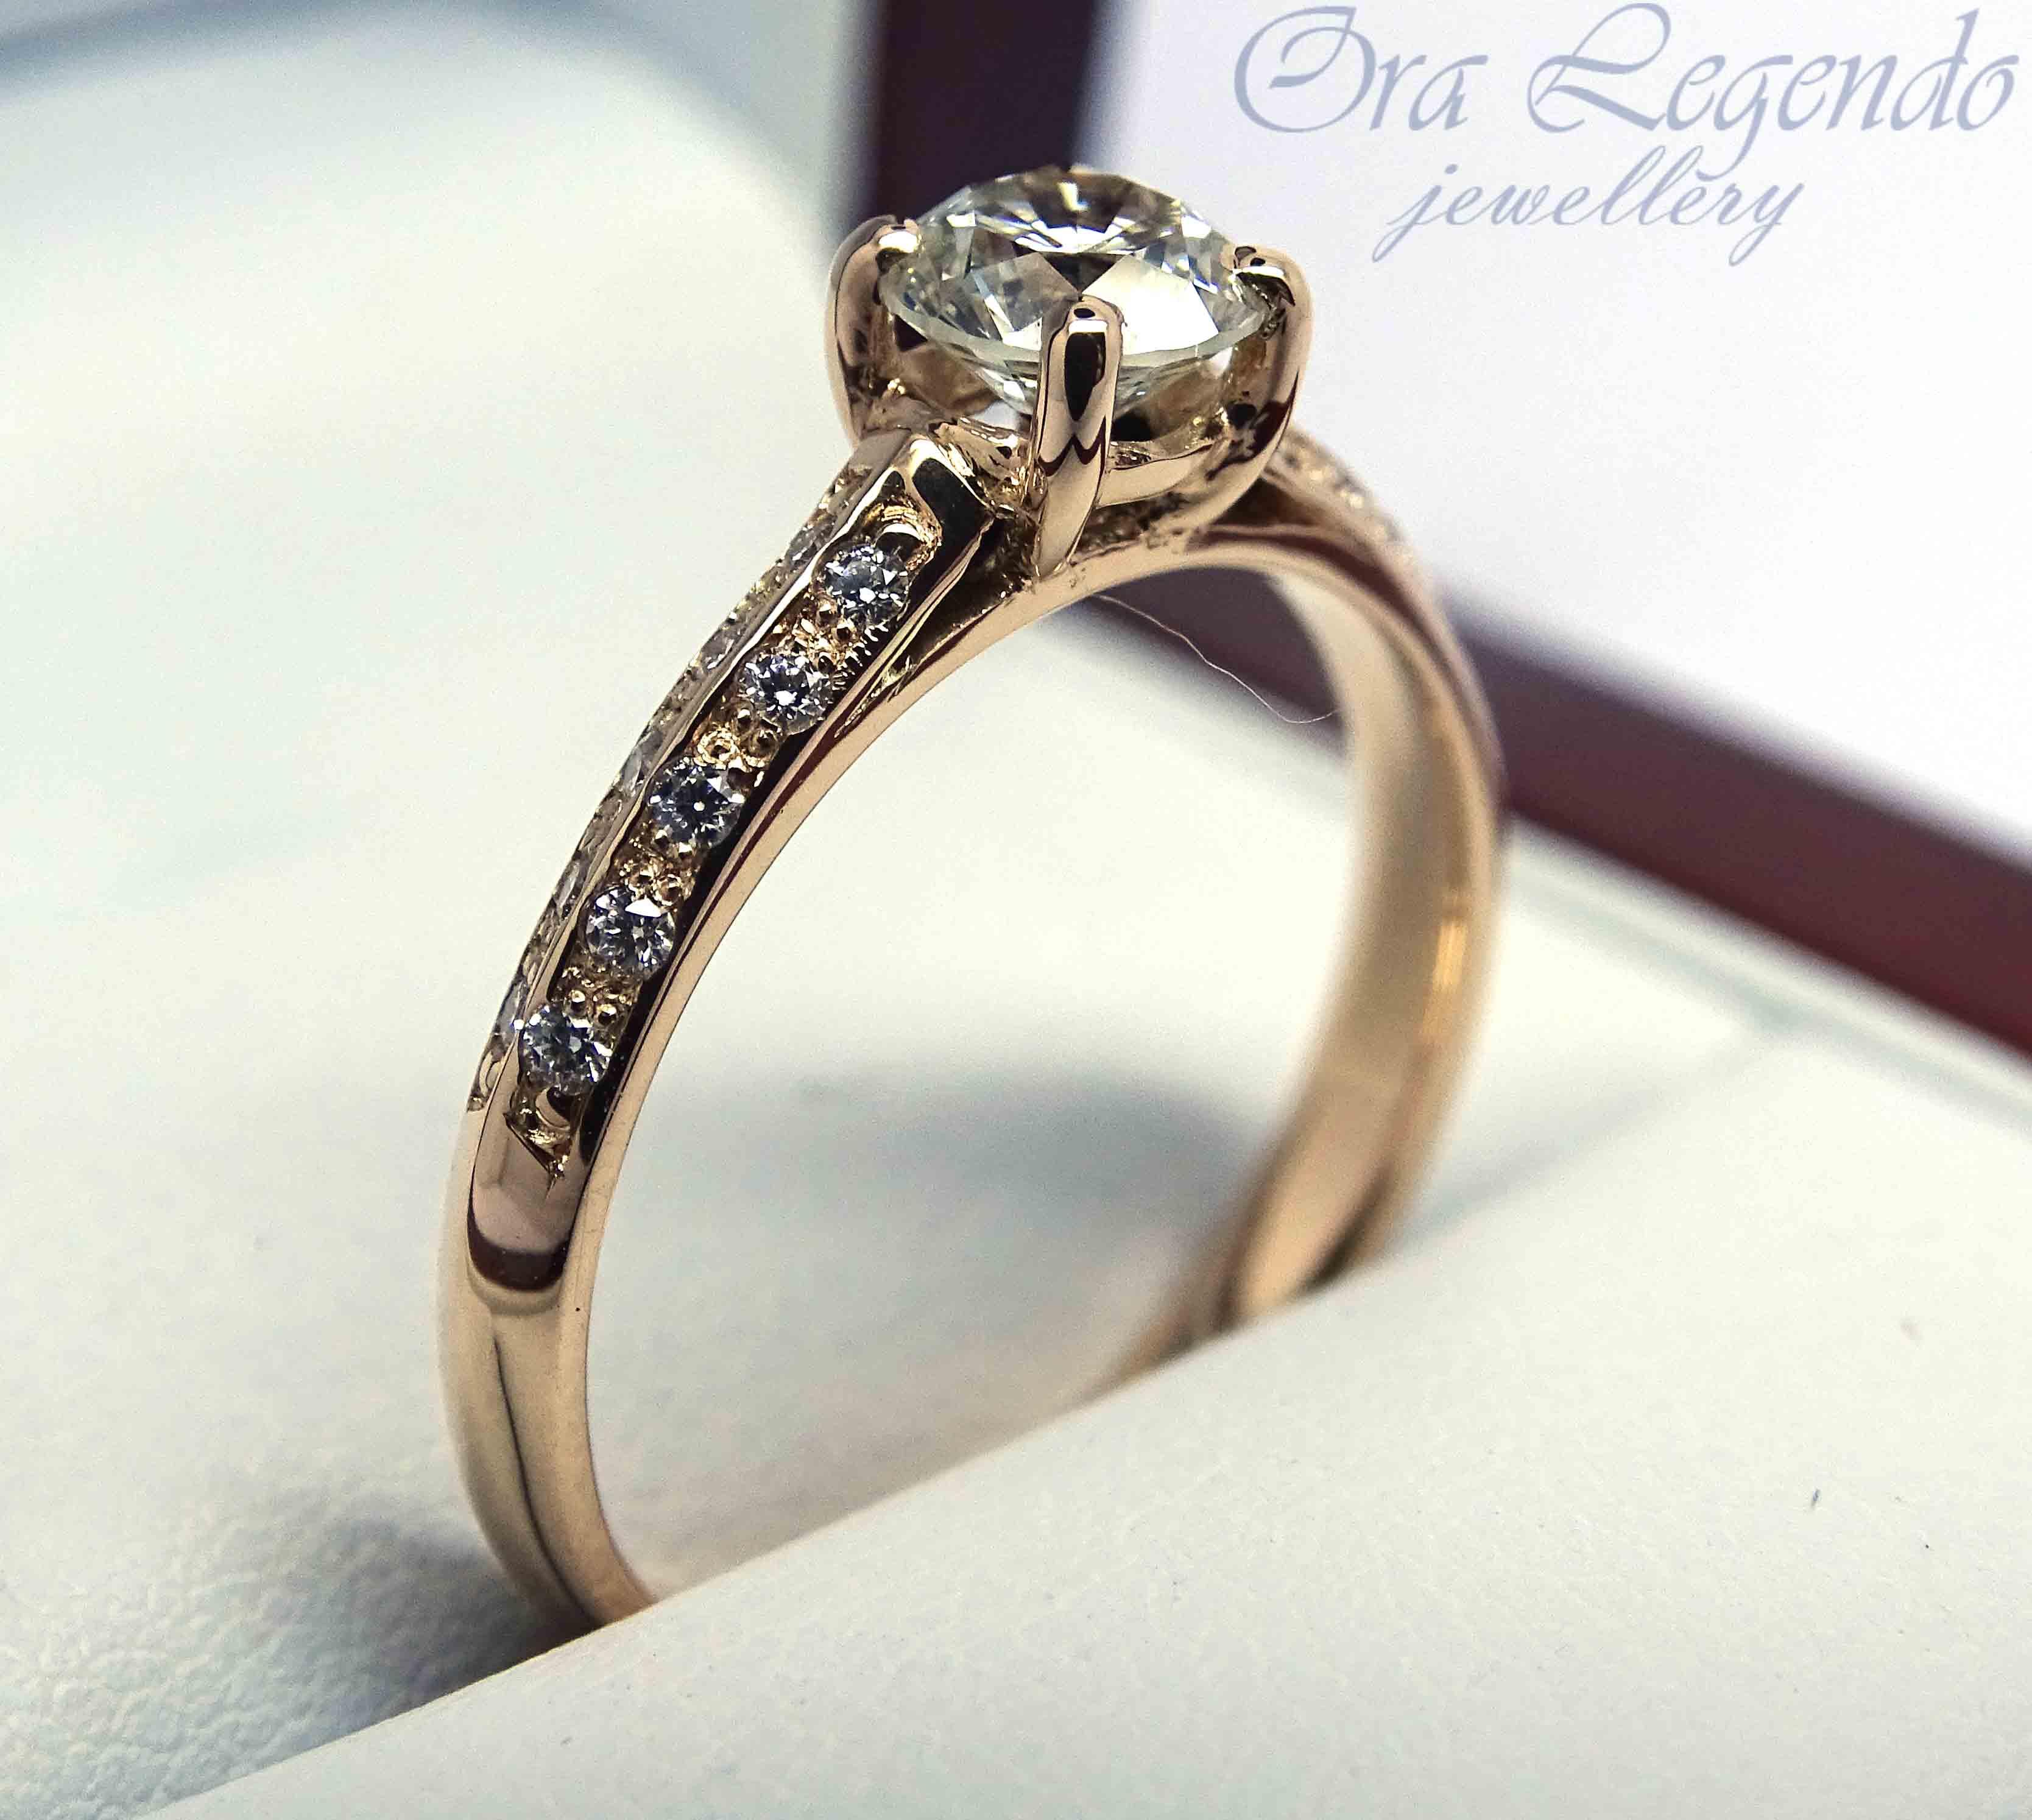 Помолвочное кольцо с бриллиантами 0,9 карат   Ora Legendo, Riga 85fee8261ea